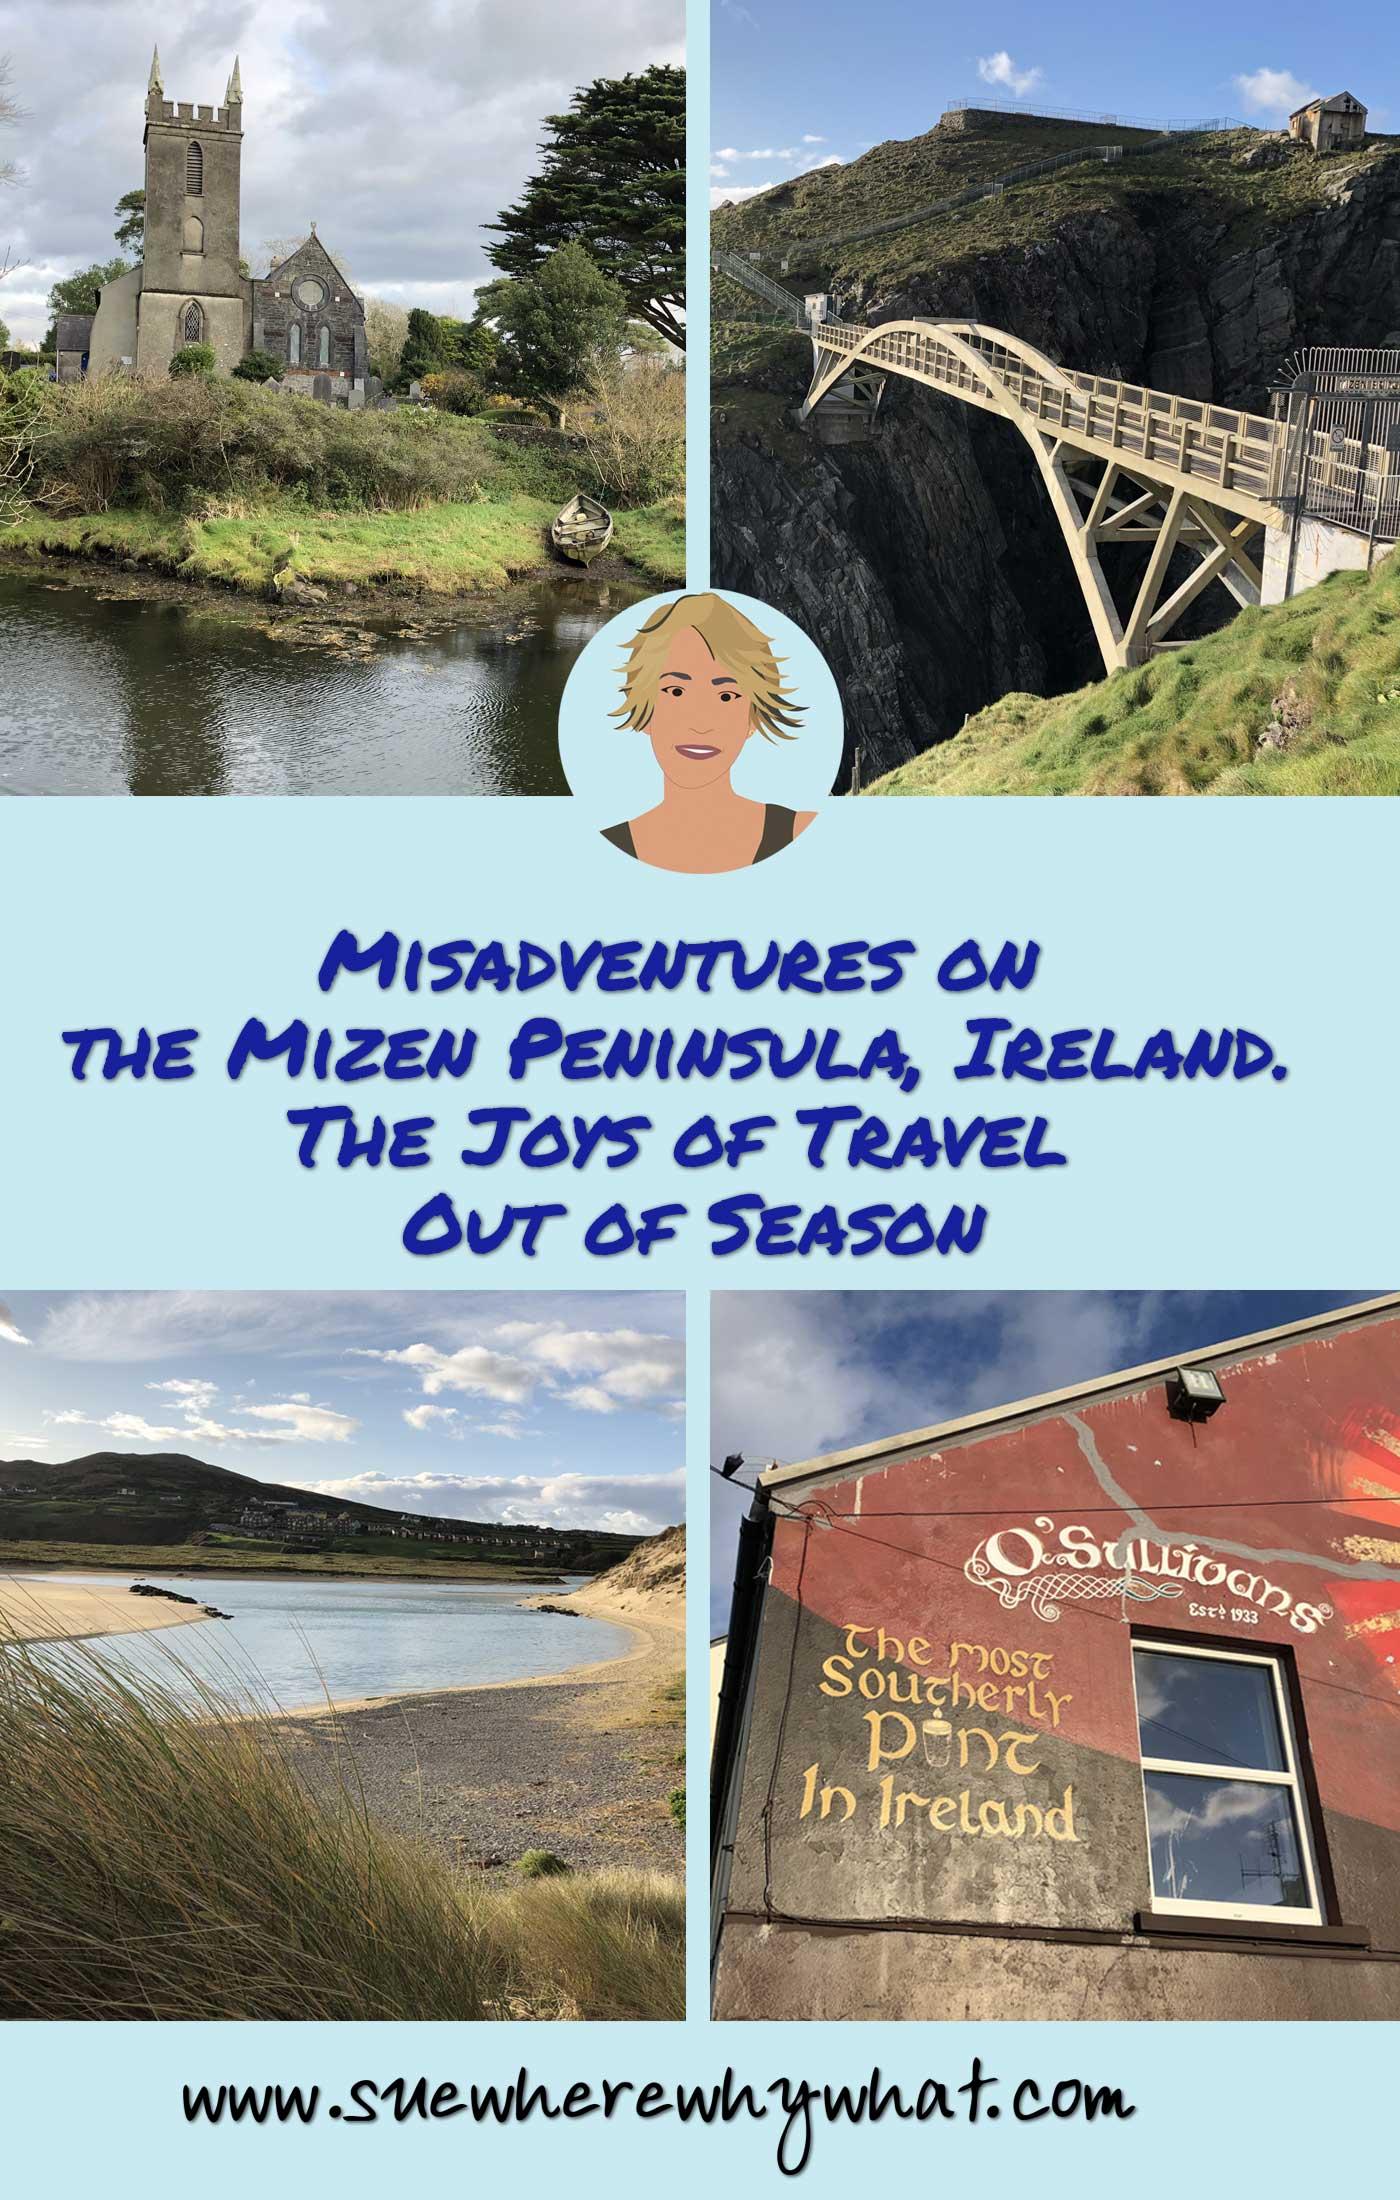 Misadventures on the Mizen Peninsula, Ireland. The Joys of Travel Out of Season